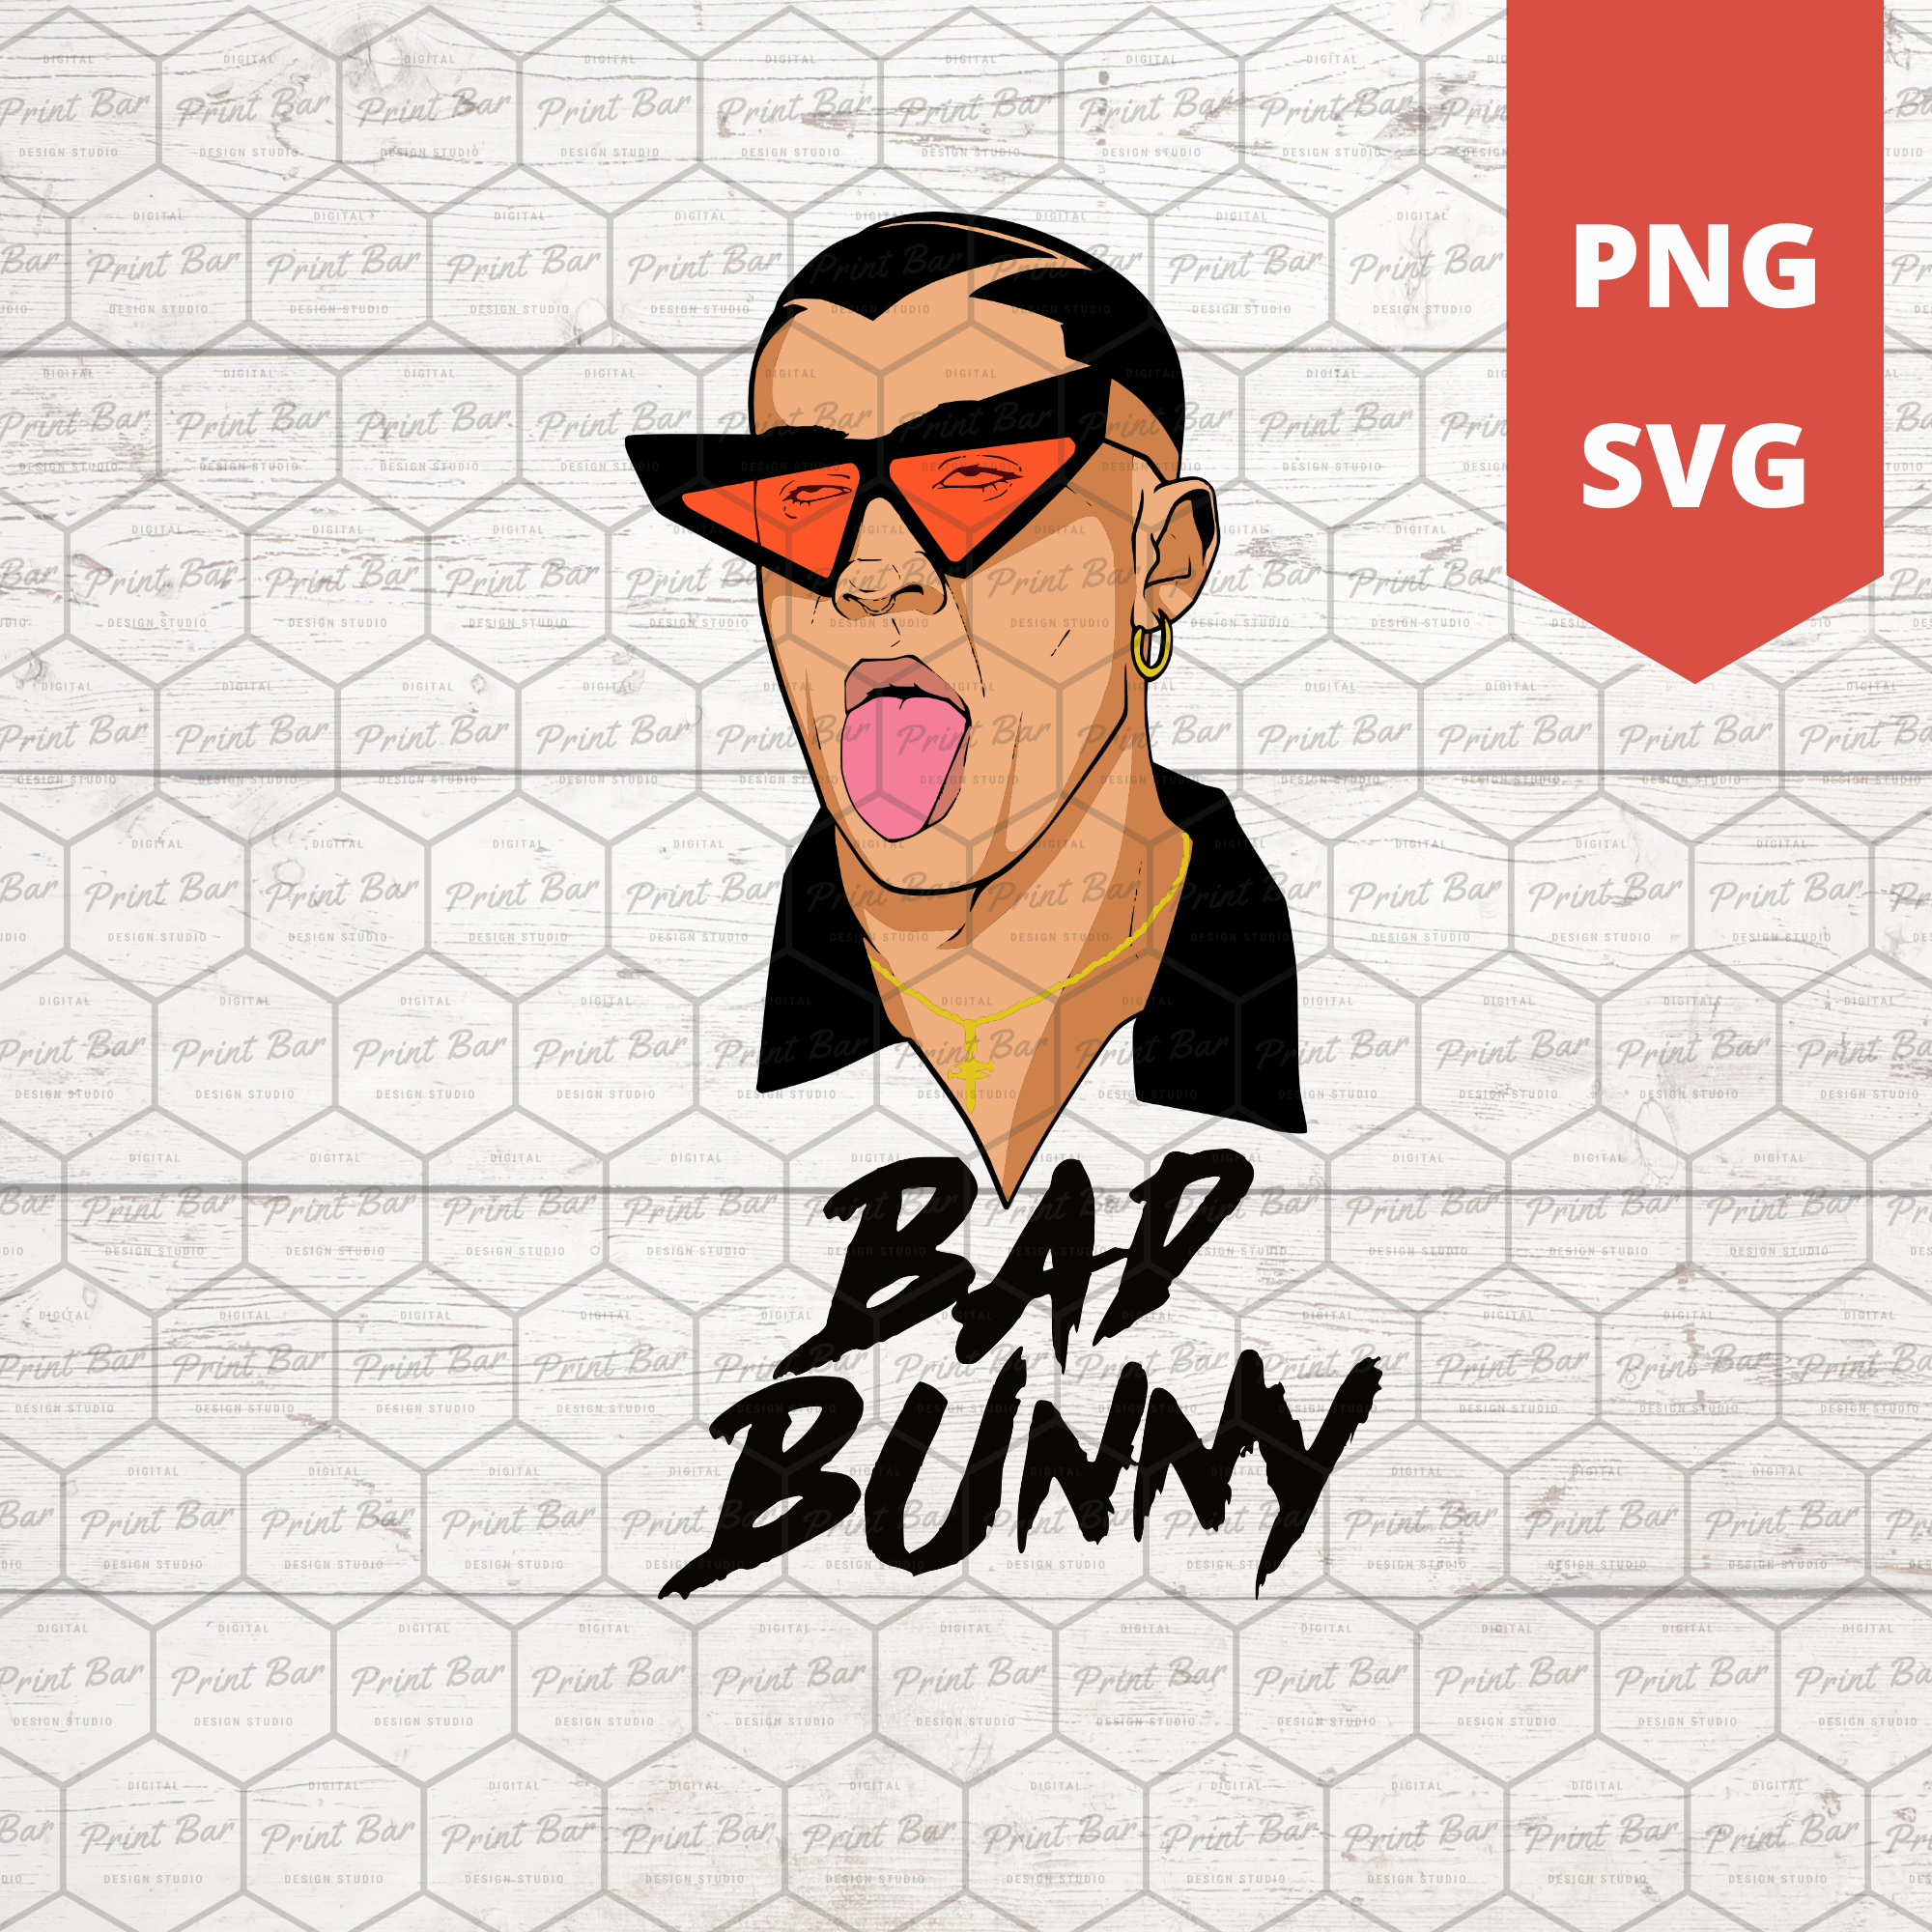 Pin On Bad Bunny Svg Cut Files